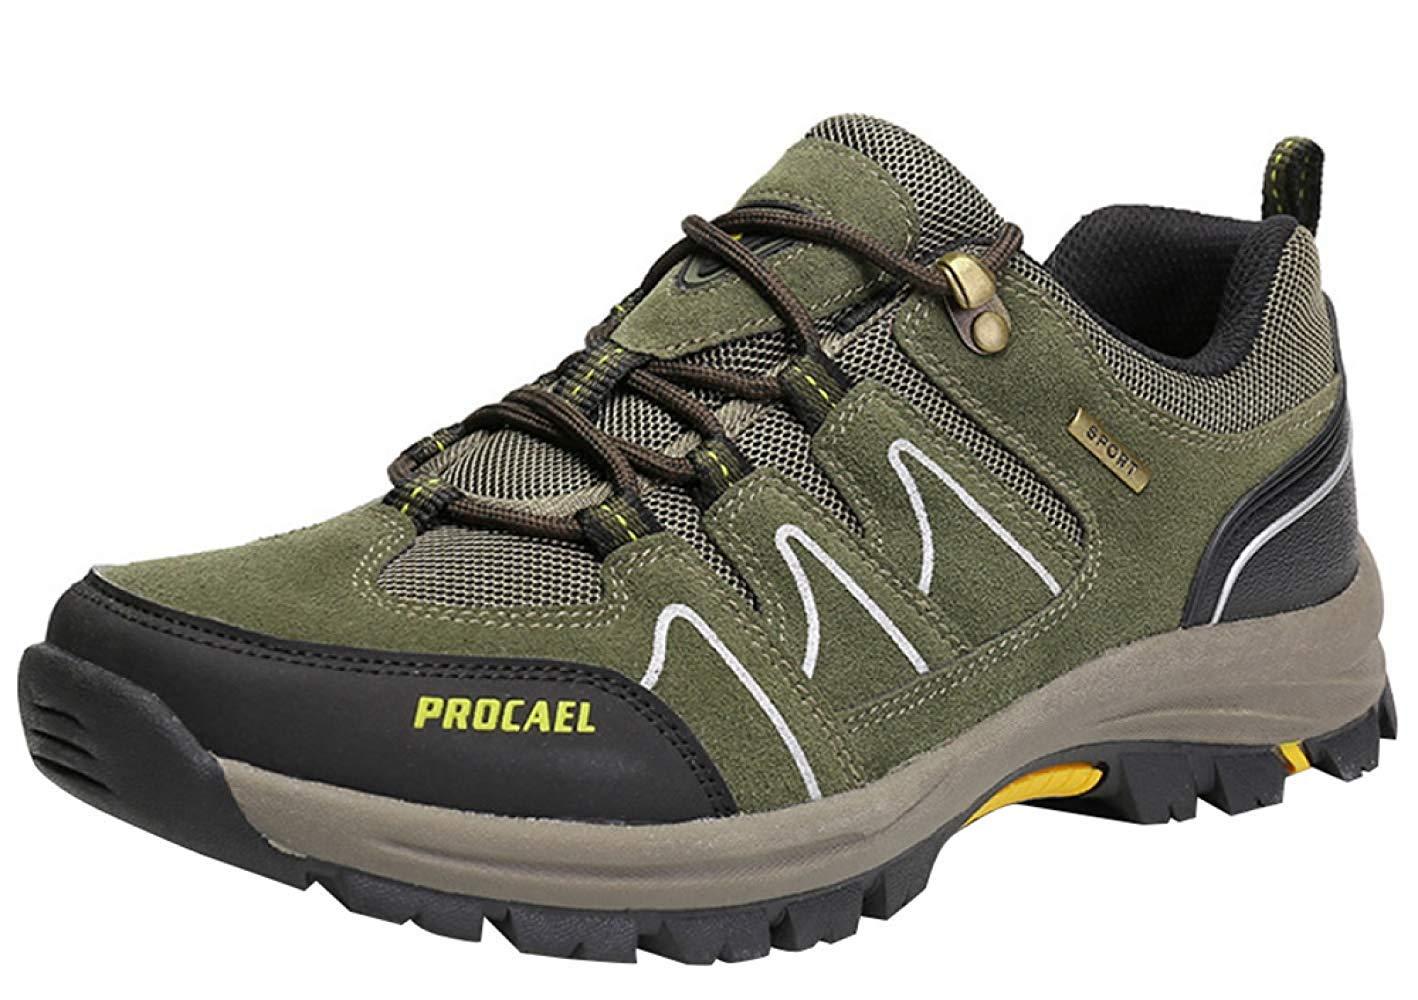 HhGold Männer Wanderschuhe Stiefel Leder Wanderschuhe Turnschuhe Für Outdoor Trekking Training Beiläufige Arbeit (Farbe : 6, Größe : 43EU)